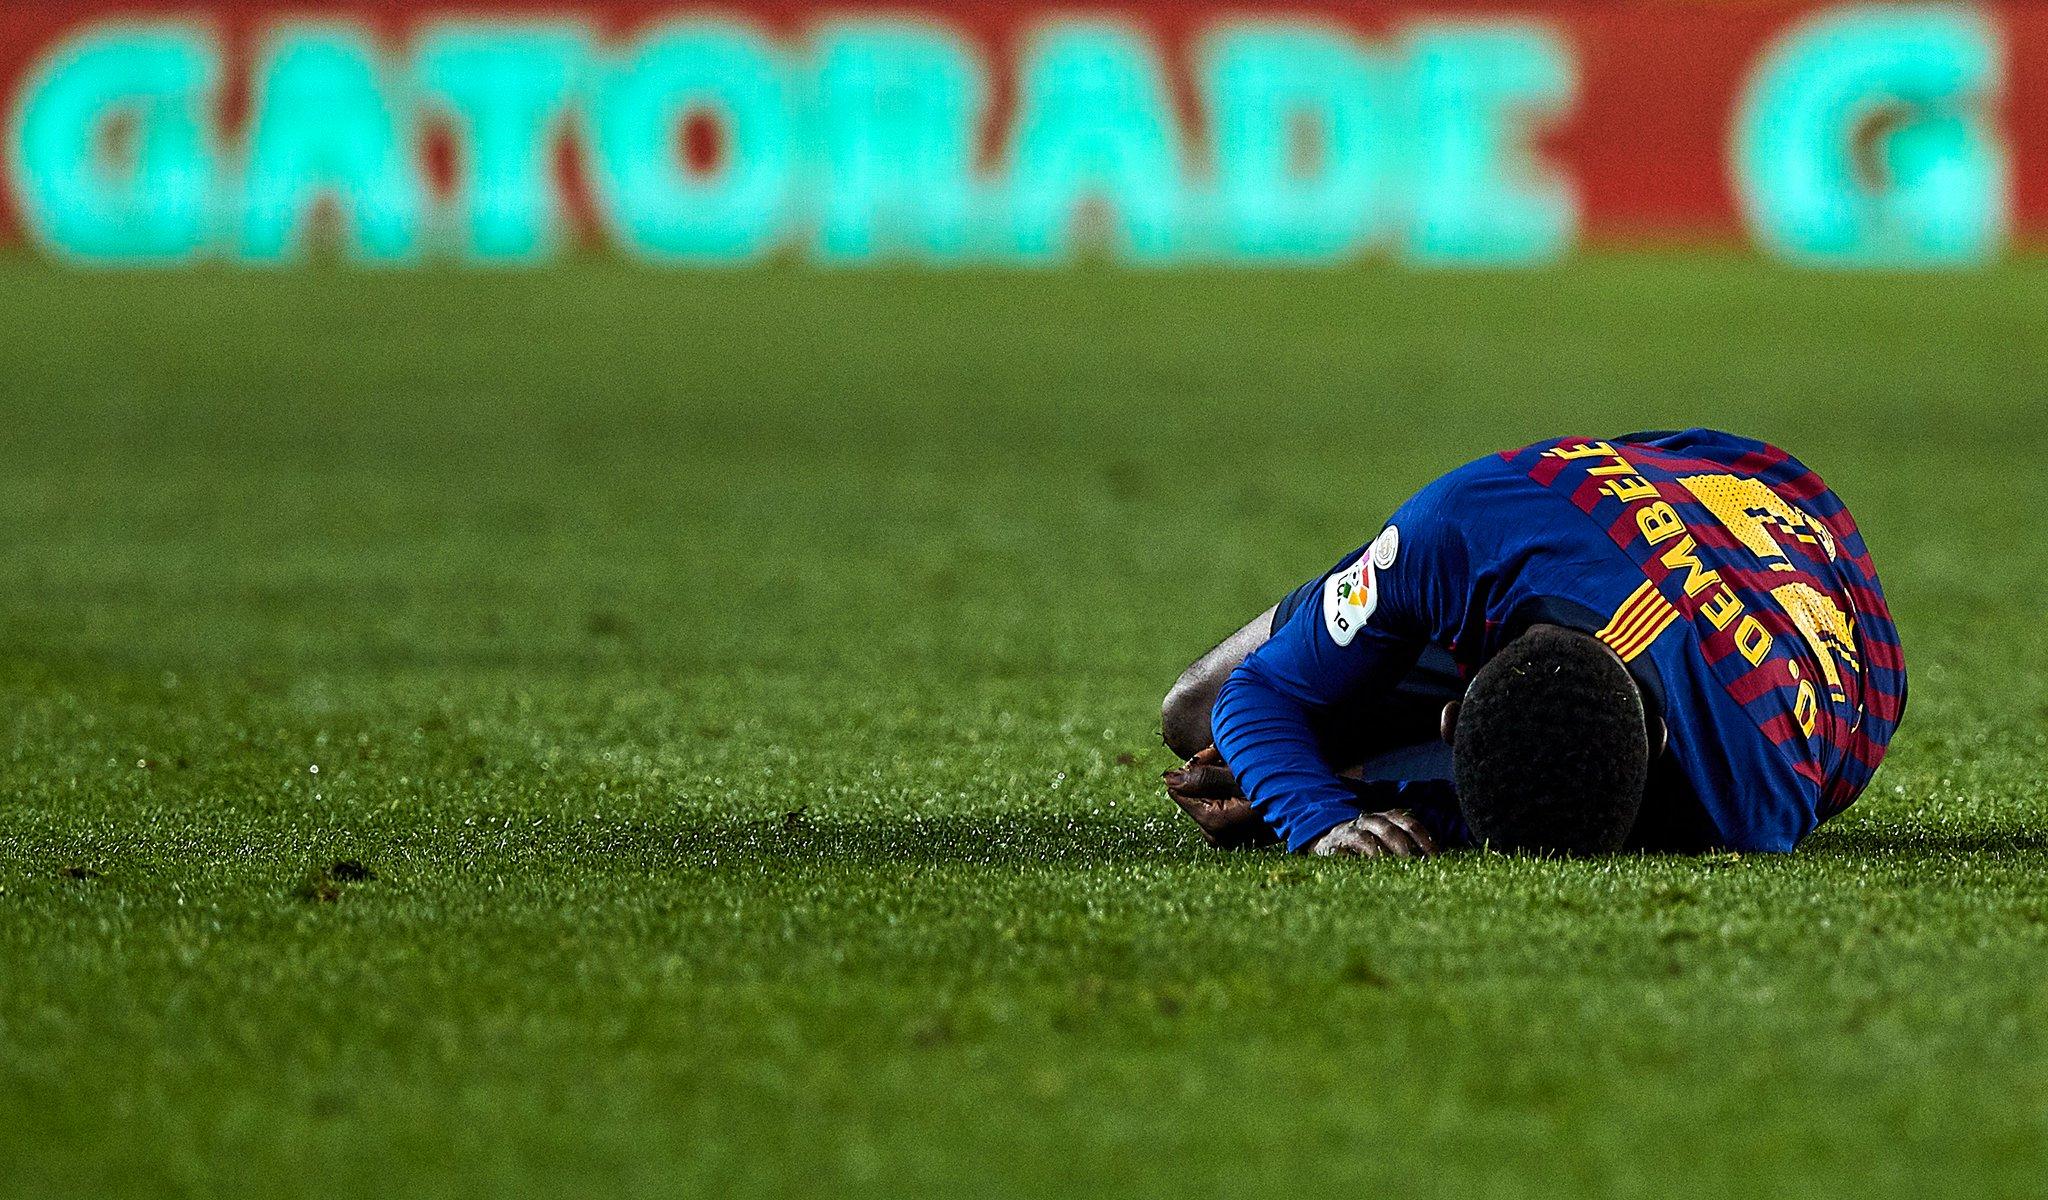 #BREAKING - Ousmane Dembélé ne jouera pas l'Euro